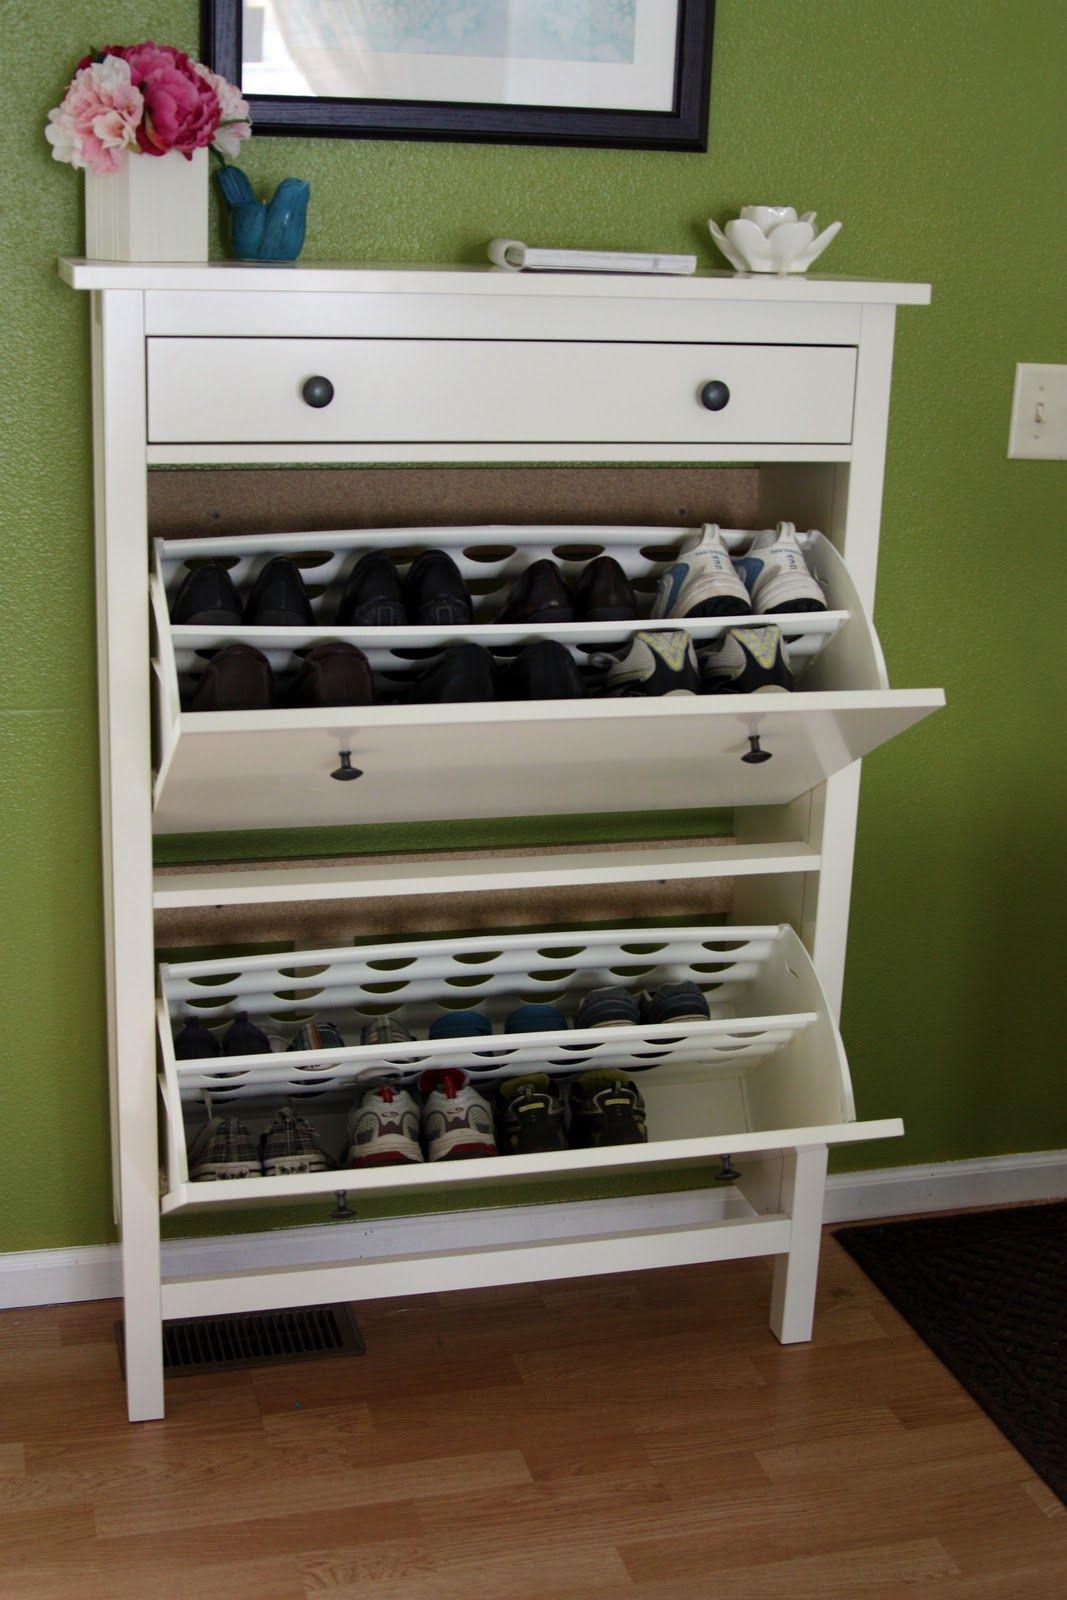 20 Genius Ways To Keep Shoes Tidy Home Organization Hallway Storage Hemnes Shoe Cabinet